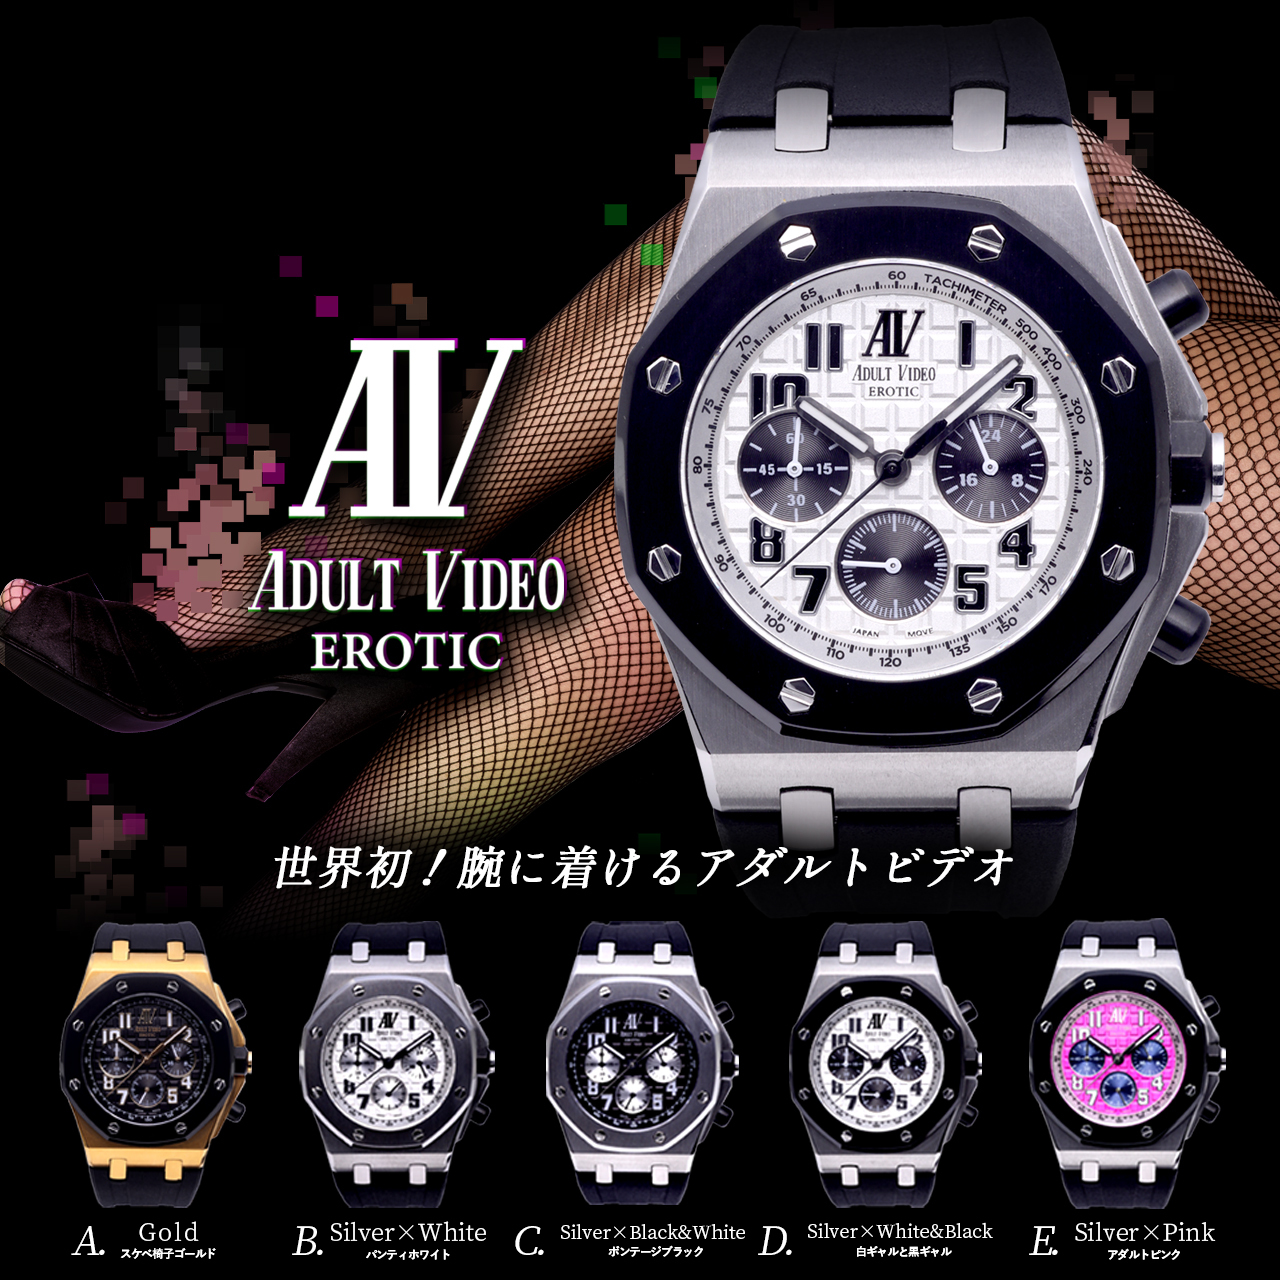 ADULT VIDEO EROTIC アダルトビデオ エロティック AV女優 日本製 ムーブメント VK63搭載 金時計 銀時計 オマージュ メンズ 腕時計